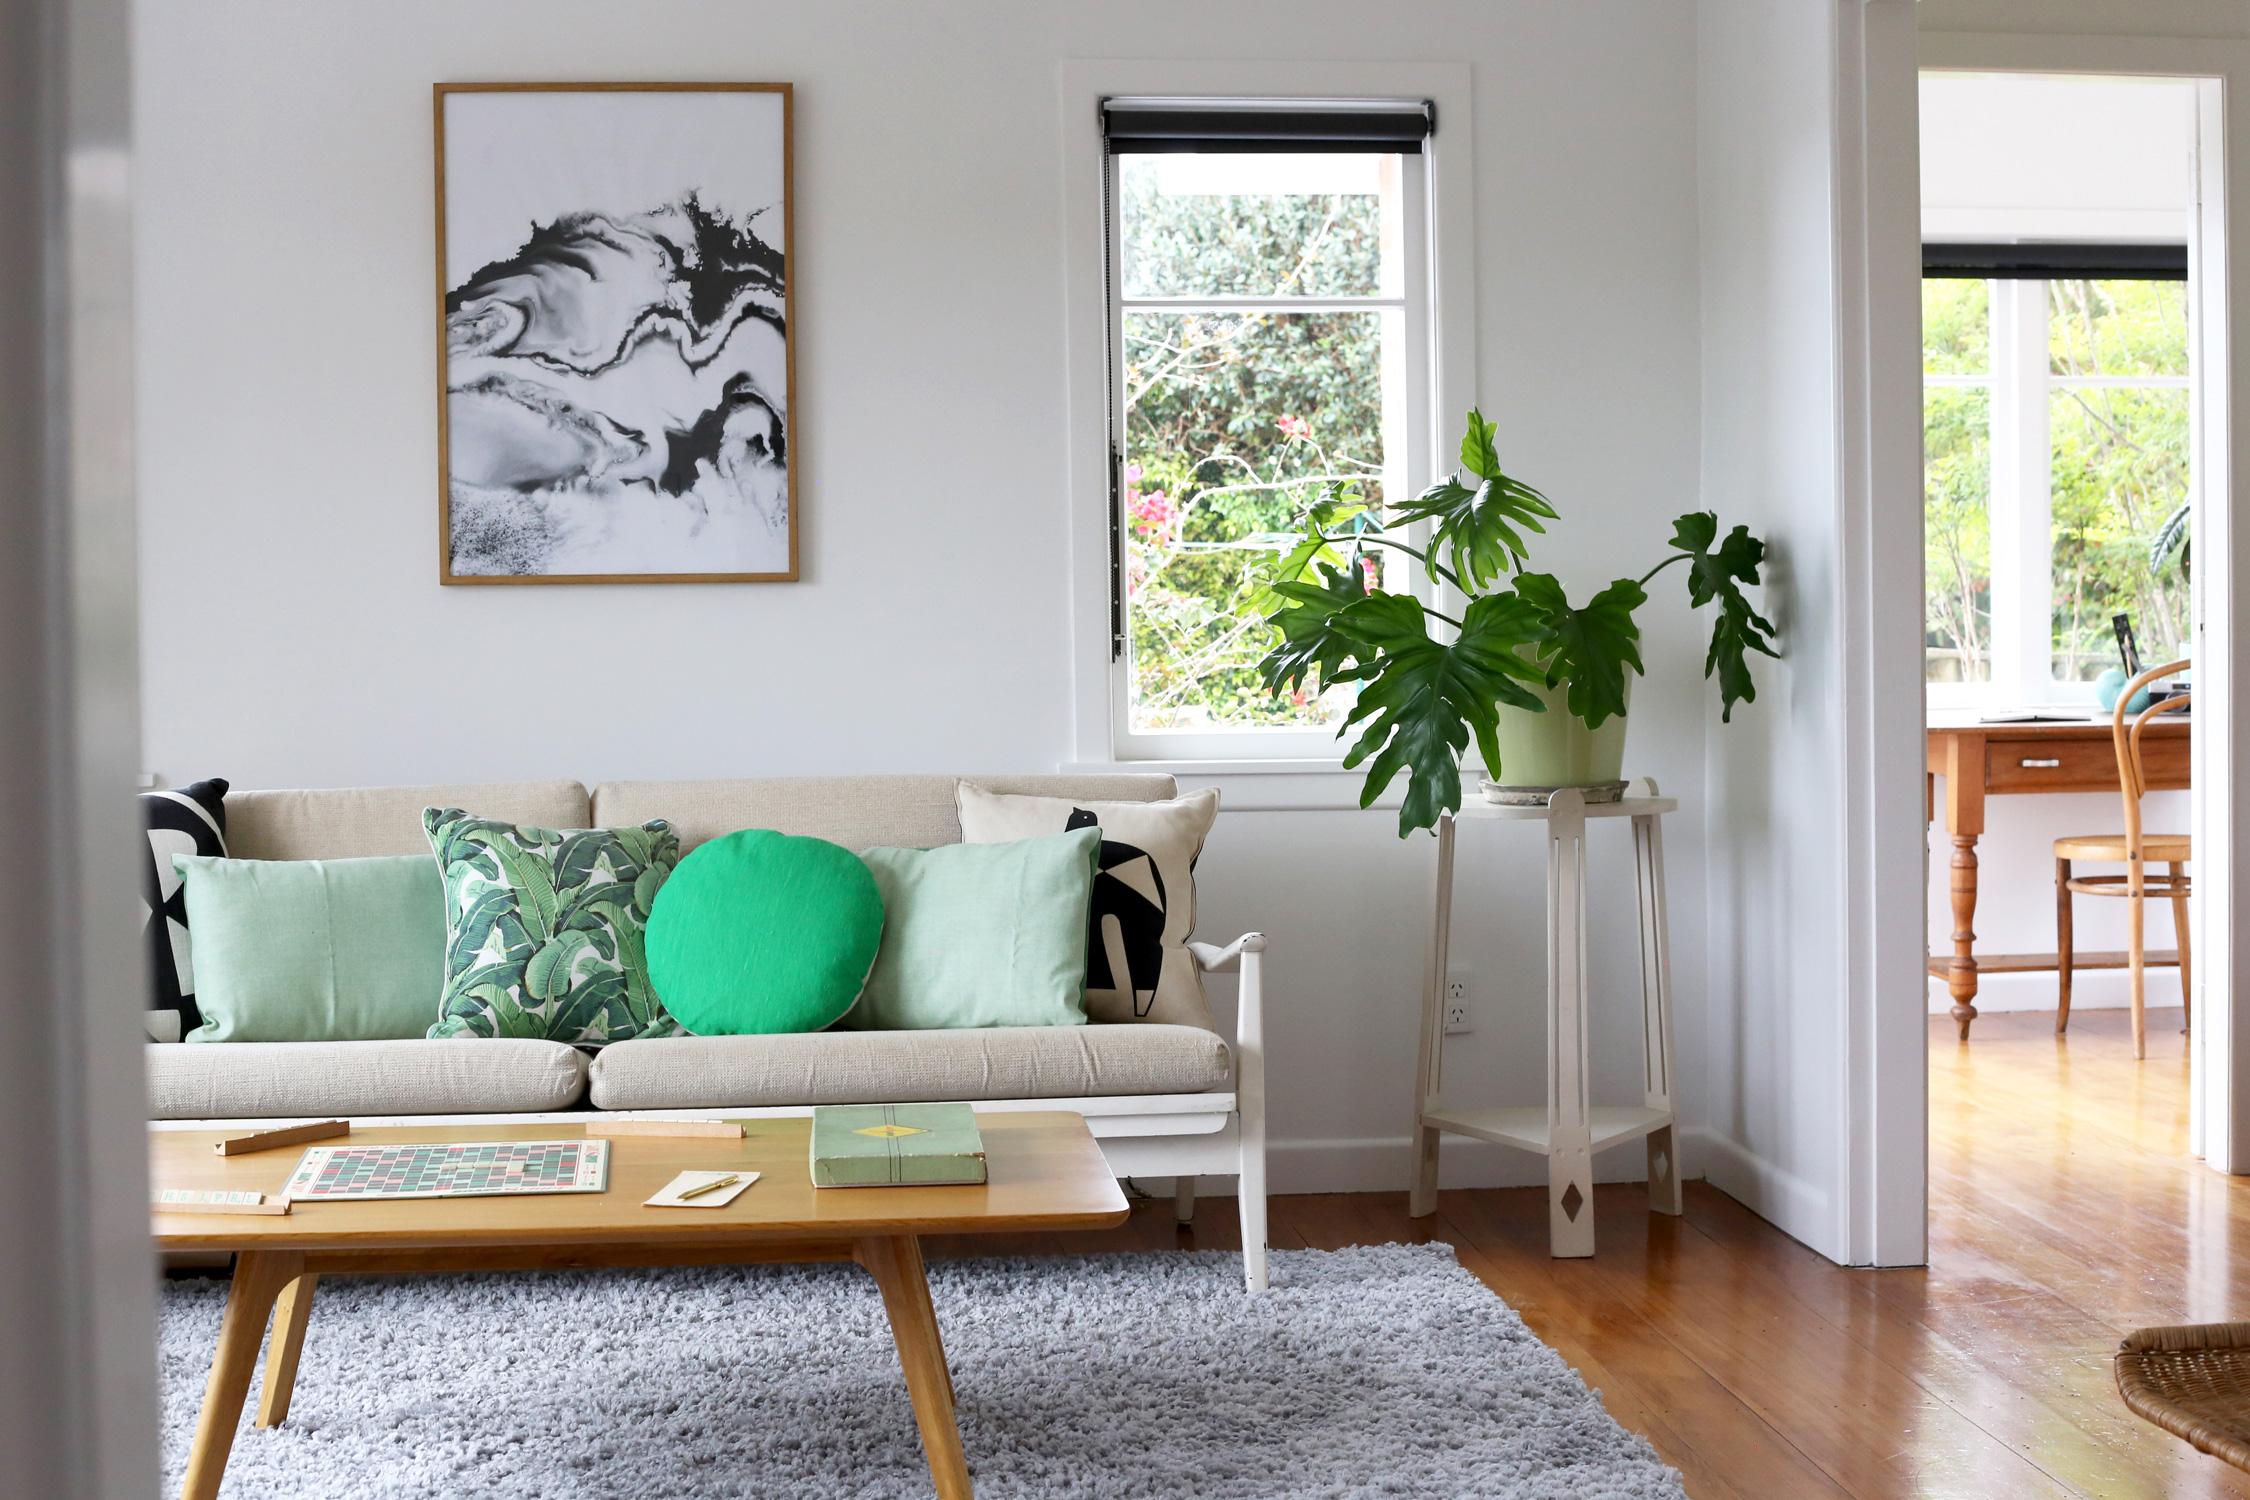 kawerau-lounge-4.jpg